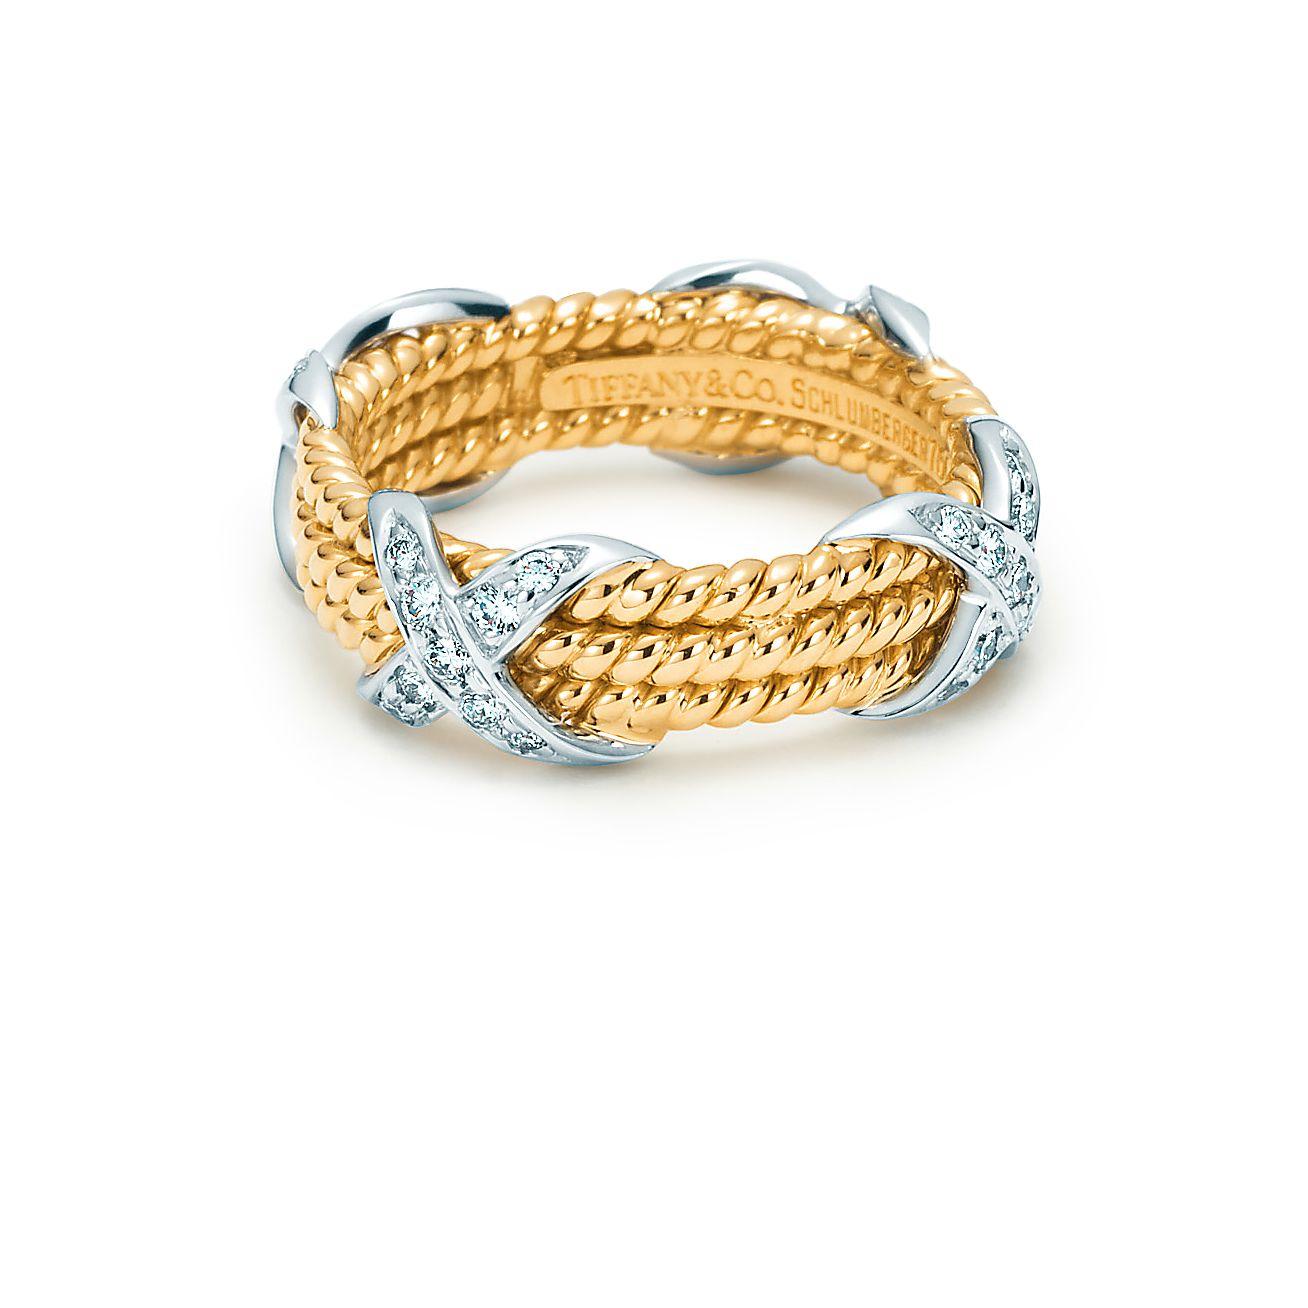 Jean Schlumberger Rope Engagement Ring